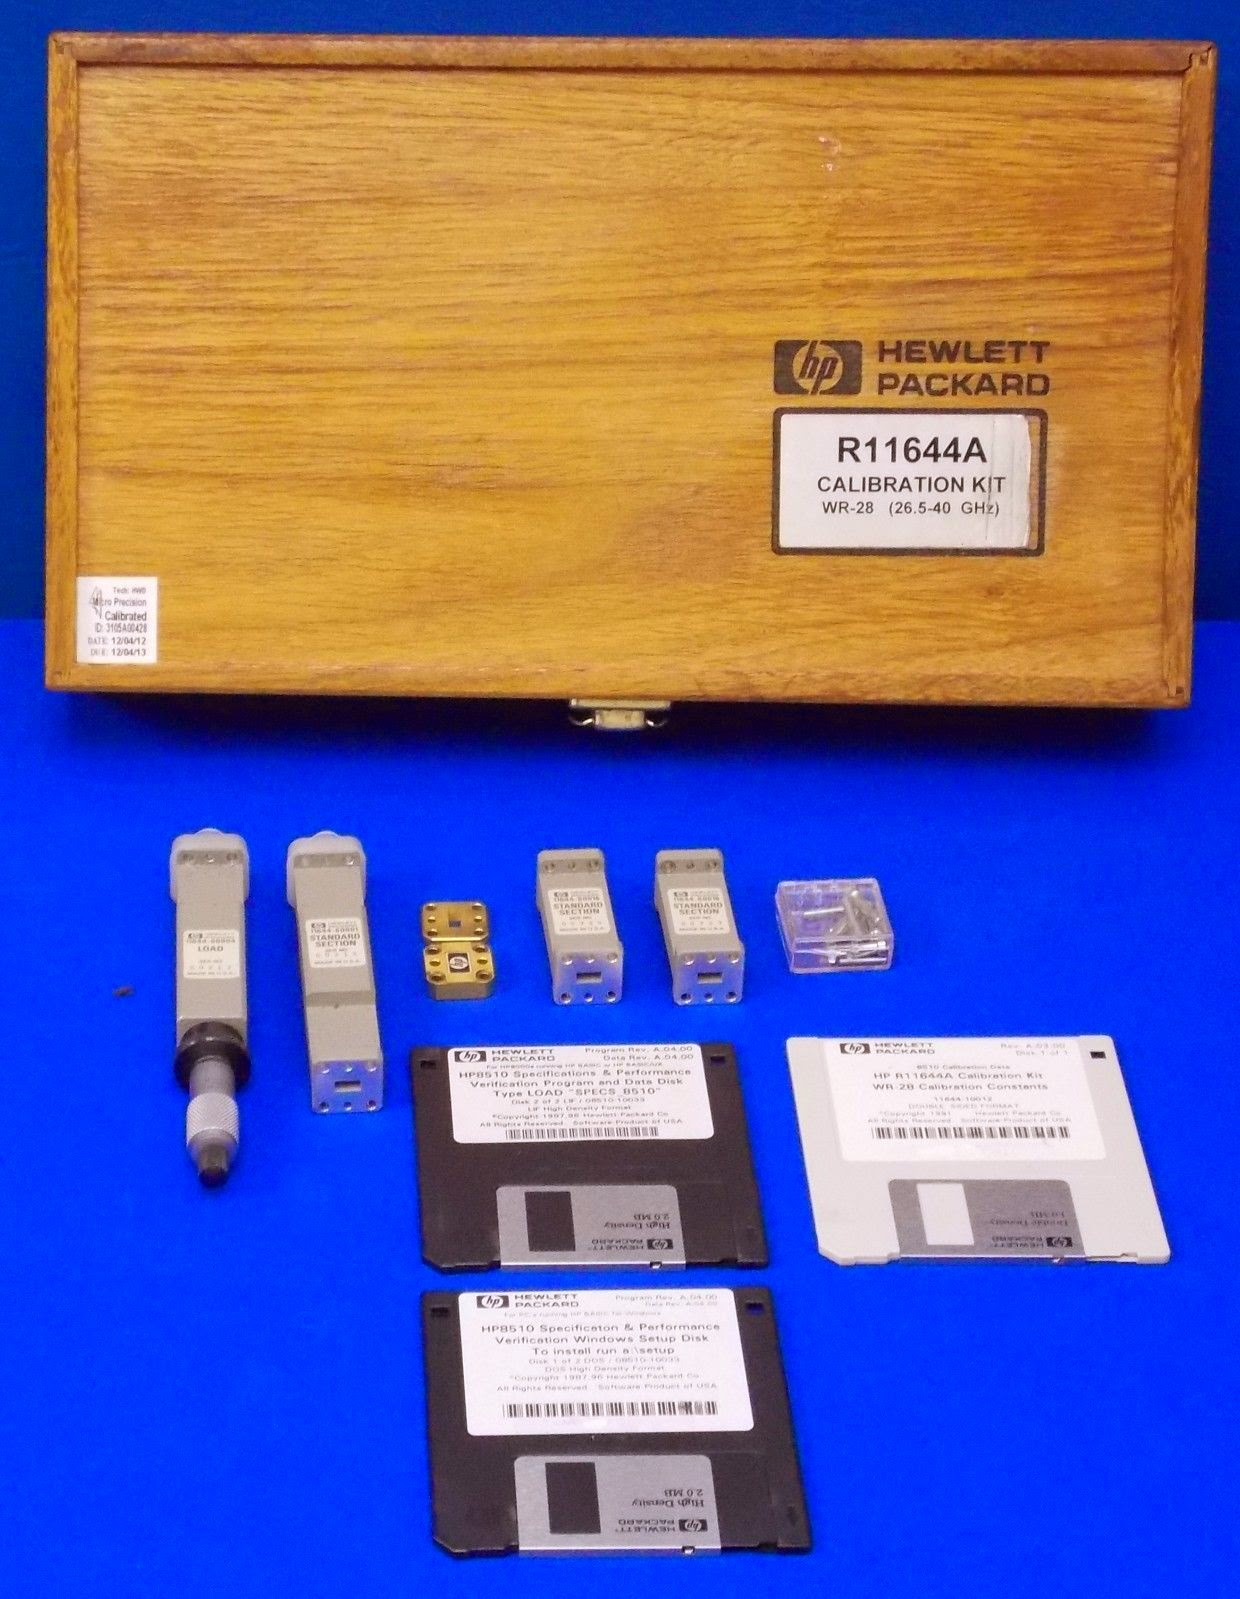 R11644A Agilent Calibration Kit photo here